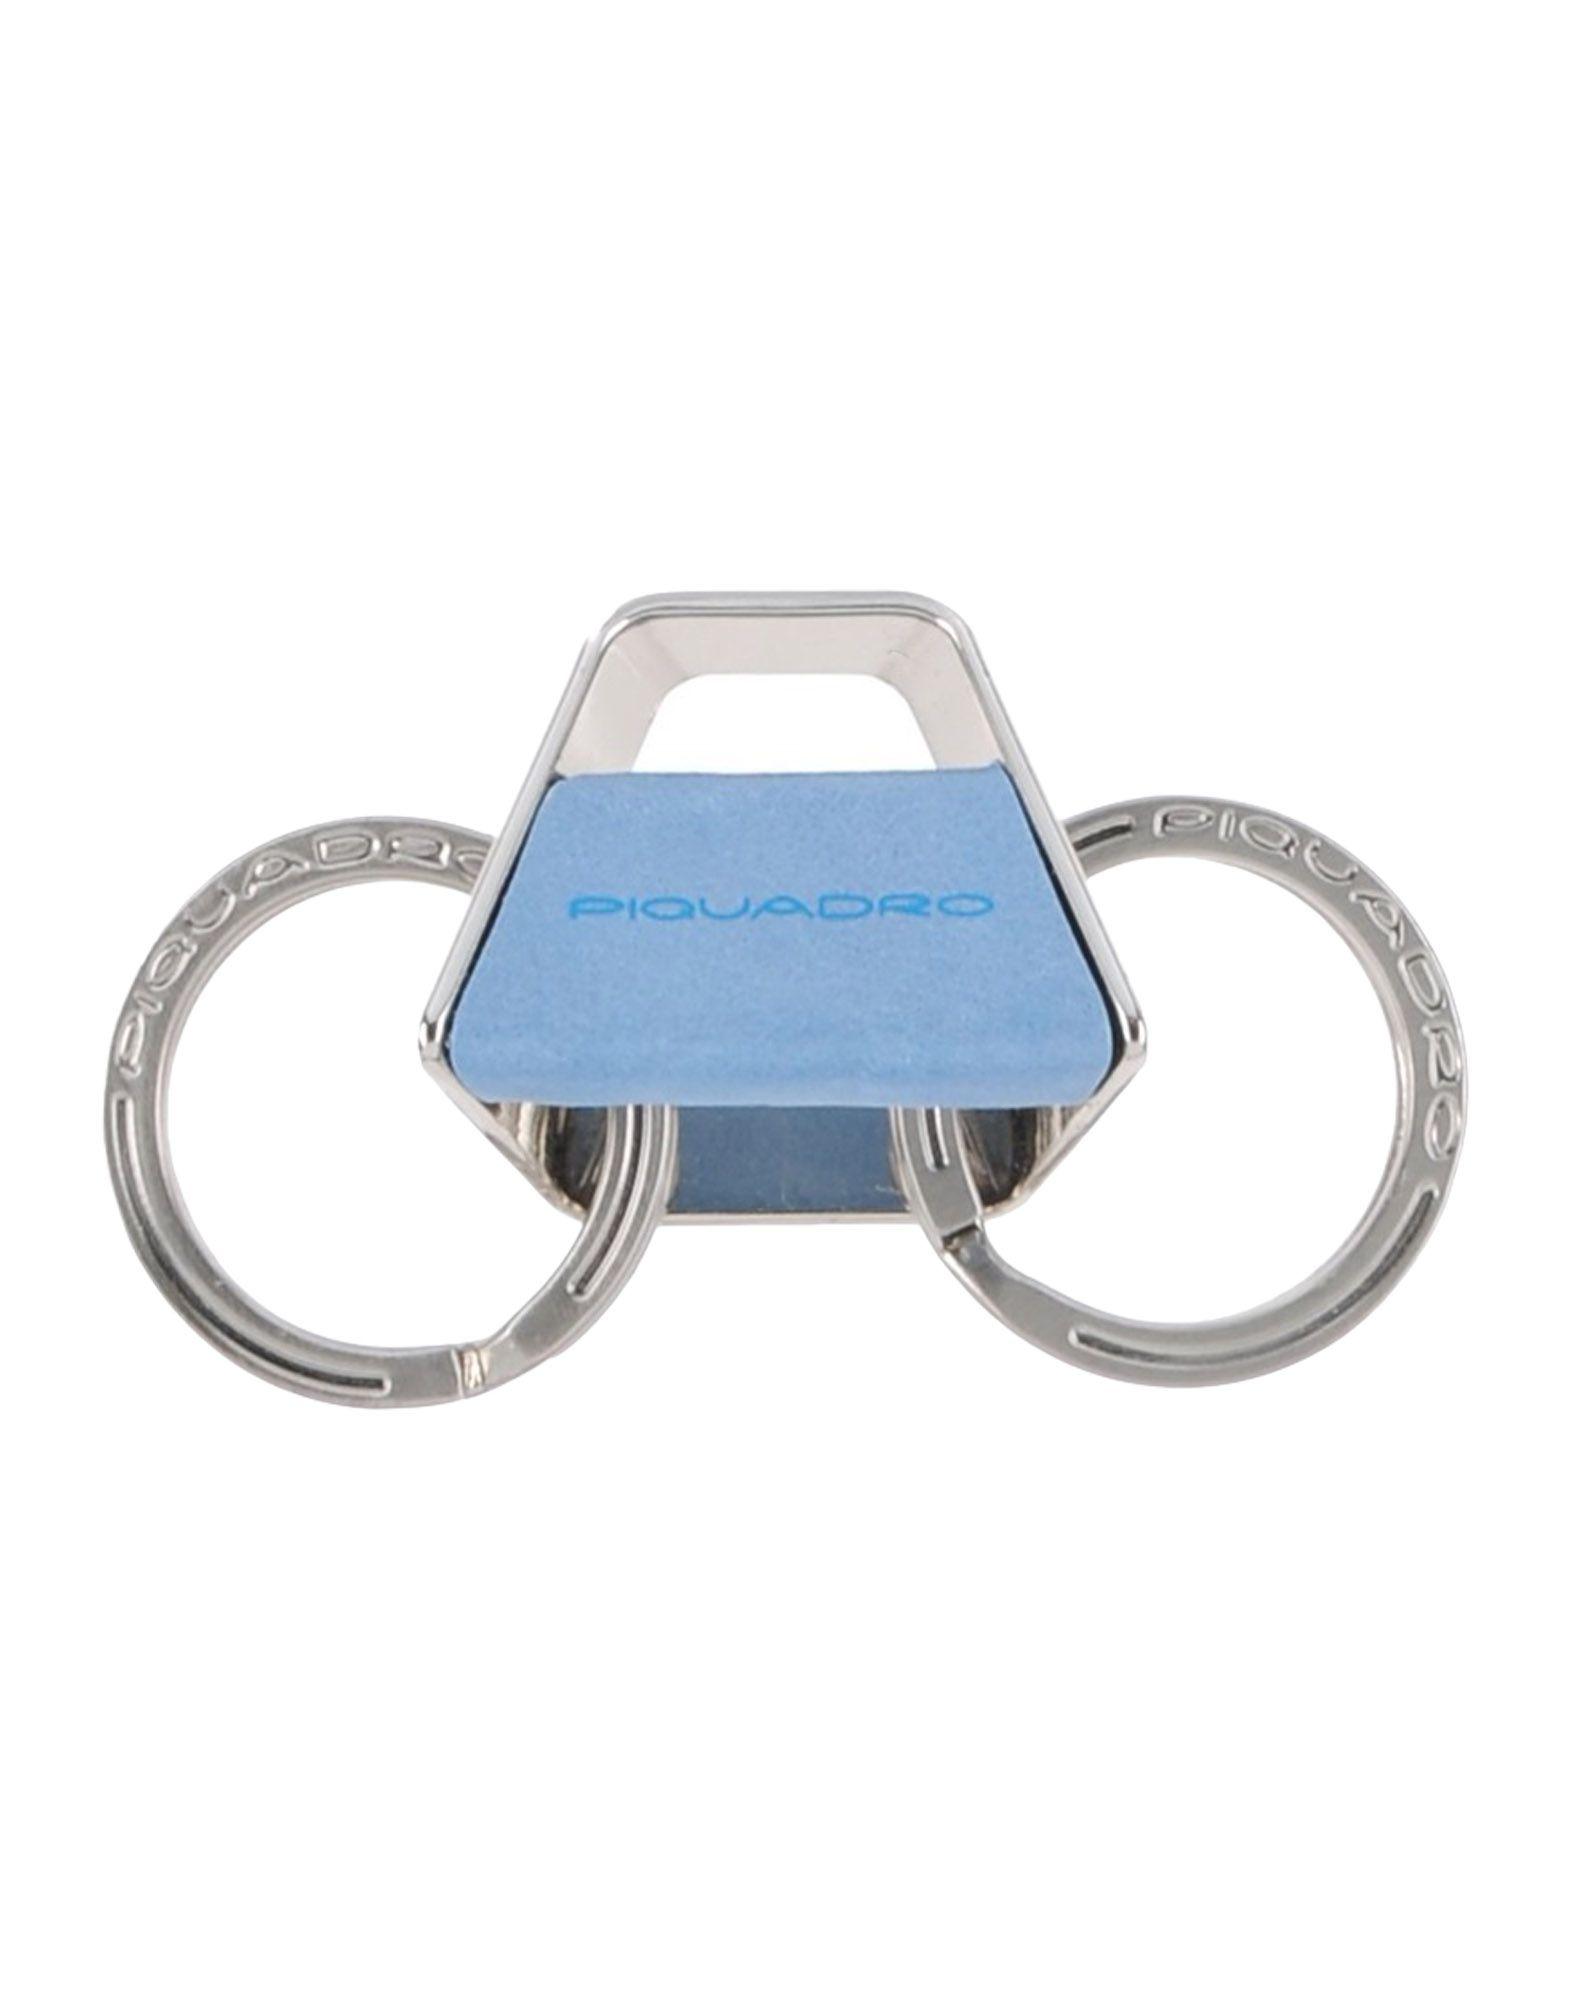 PIANURASTUDIO Брелок для ключей брелок для ключей поршень